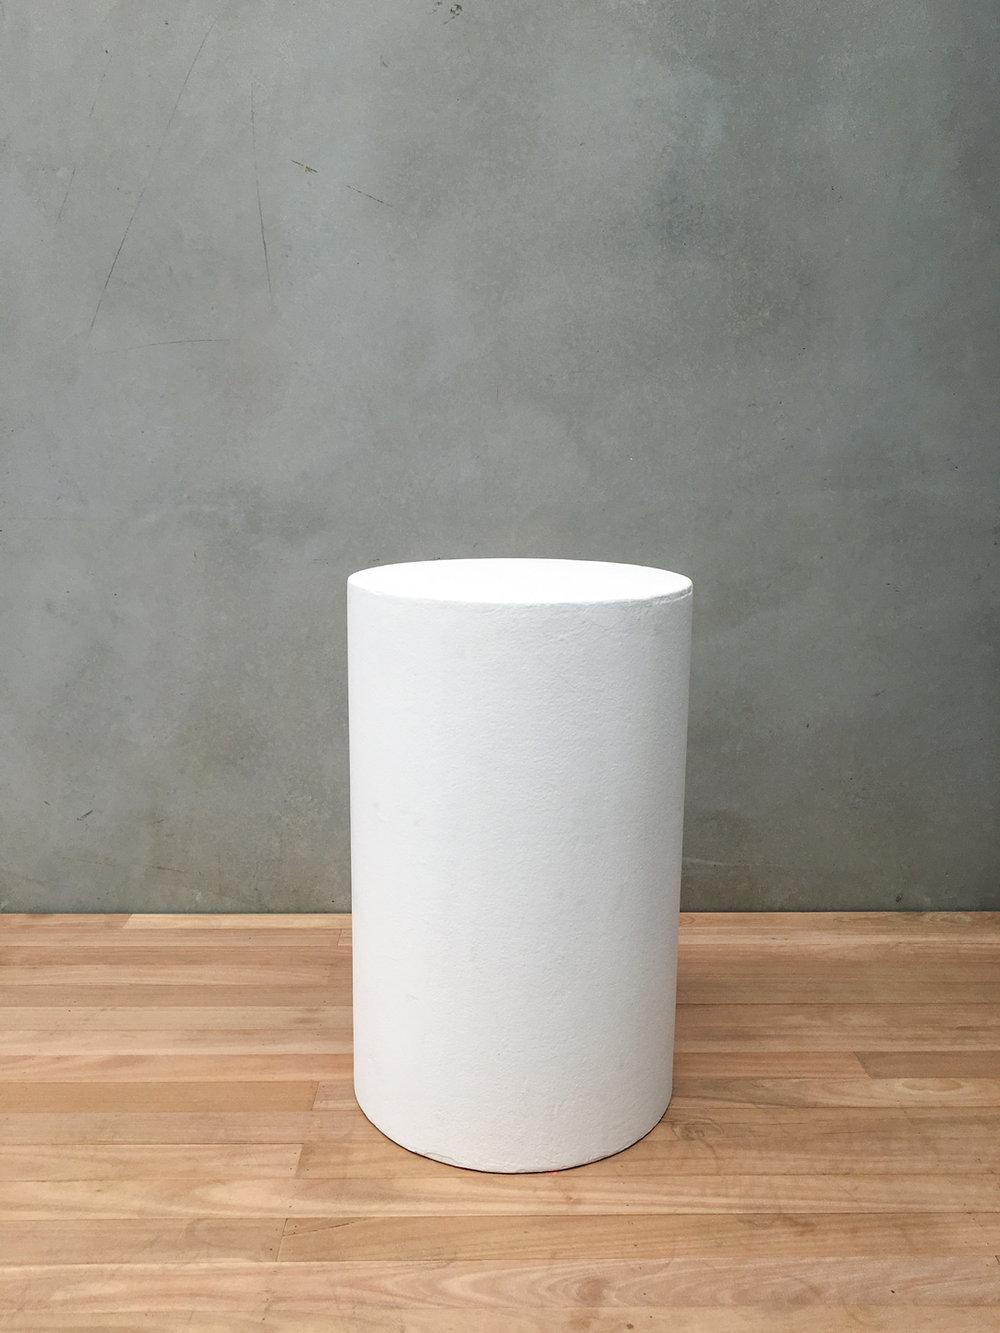 500 X 800 CYLINDRICAL WHITE